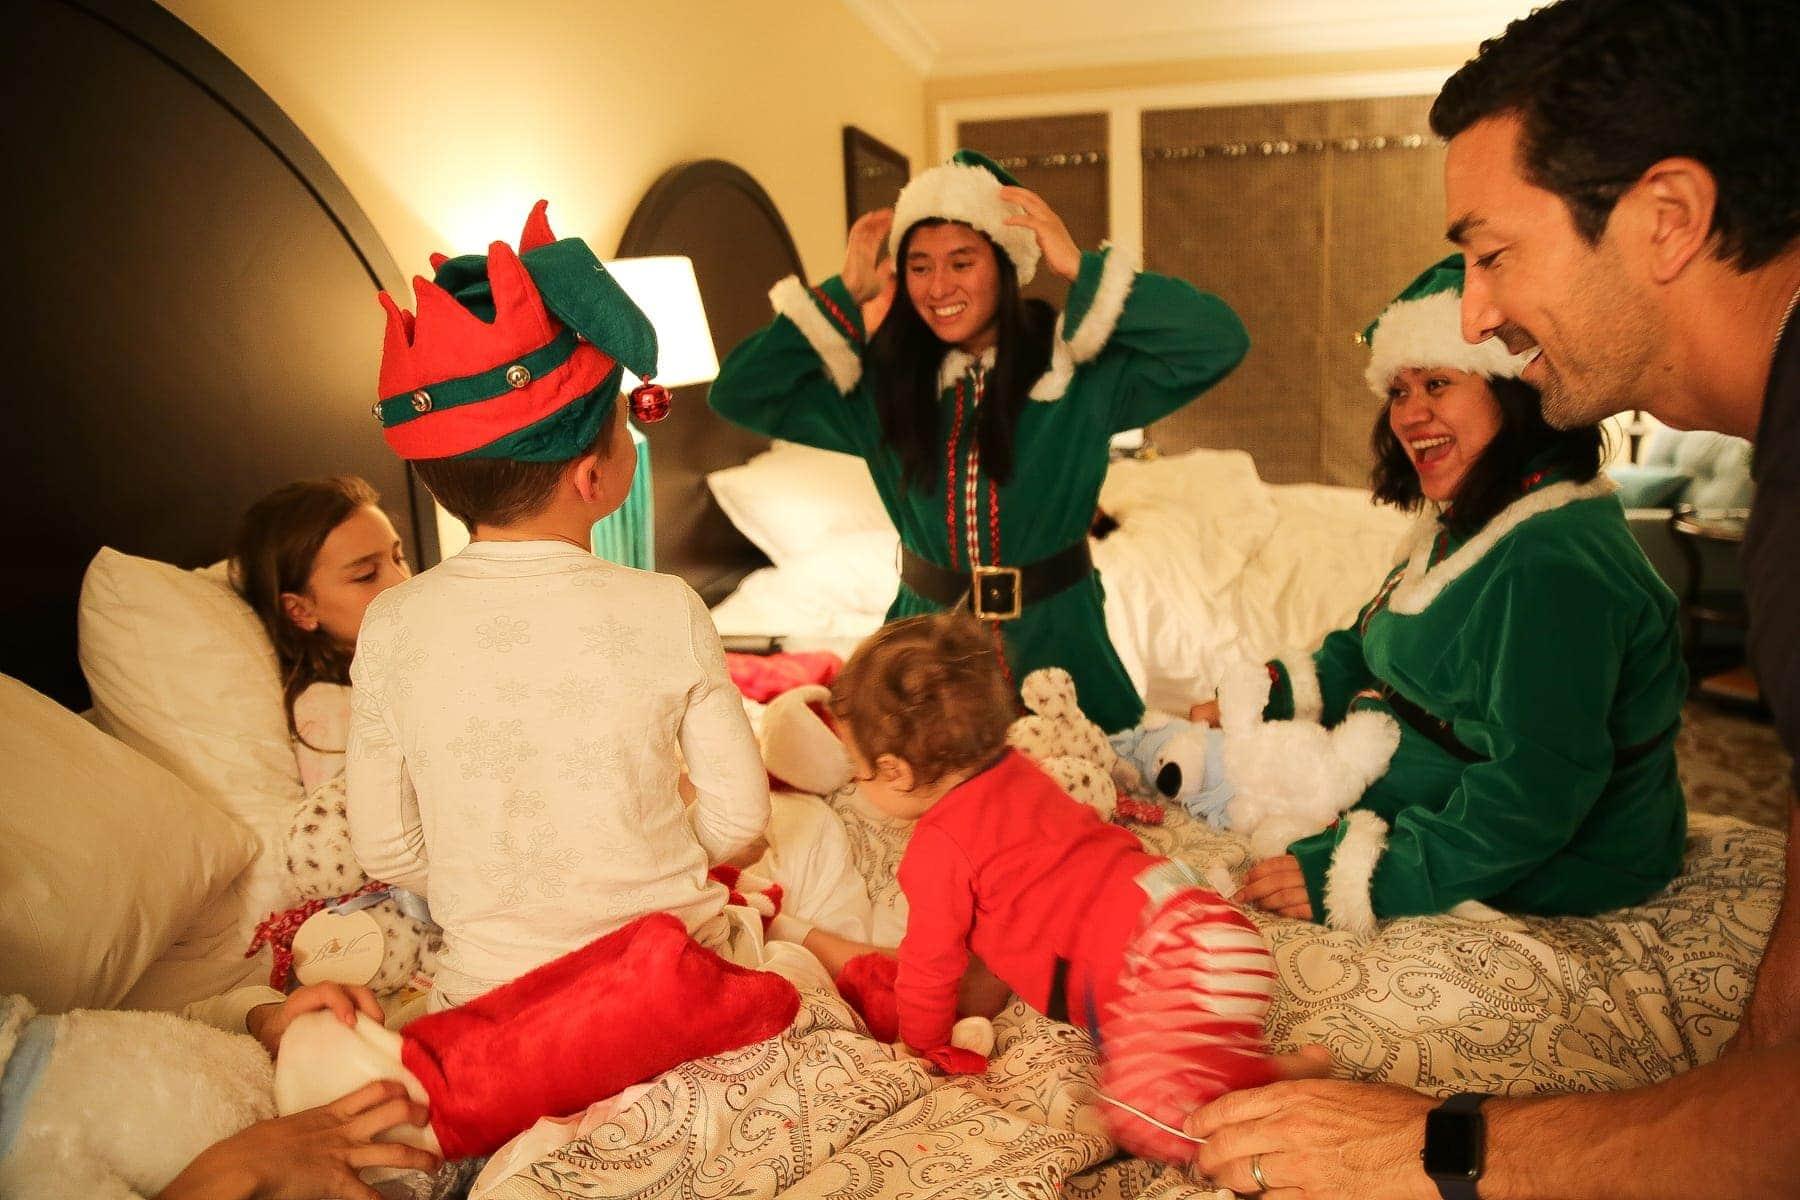 family on christmas with santa's elves